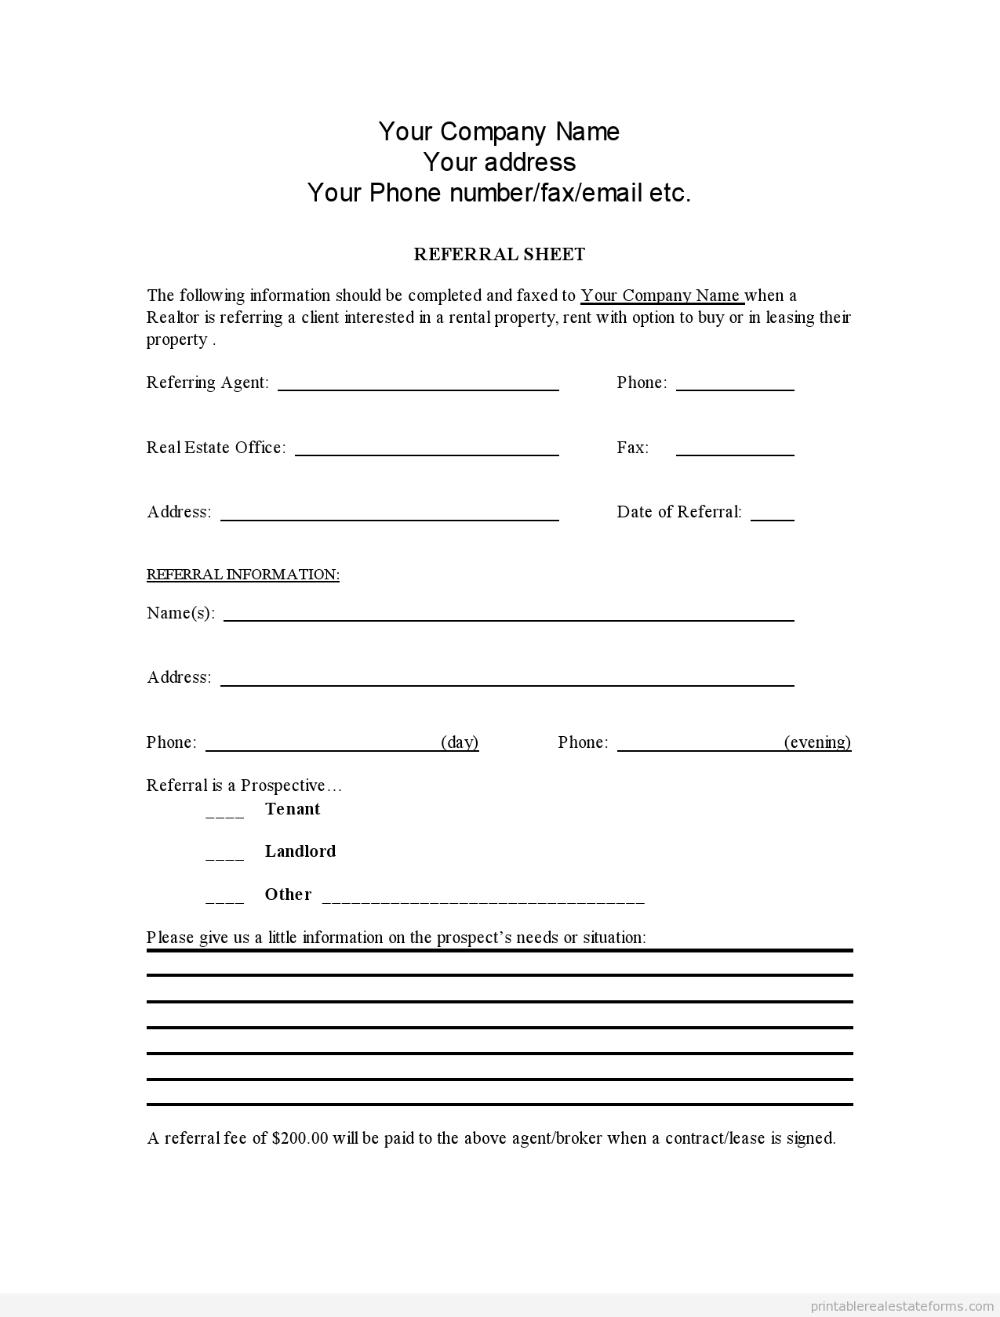 Sample Printable Referral Sheet For Realtors Form Latest Sample